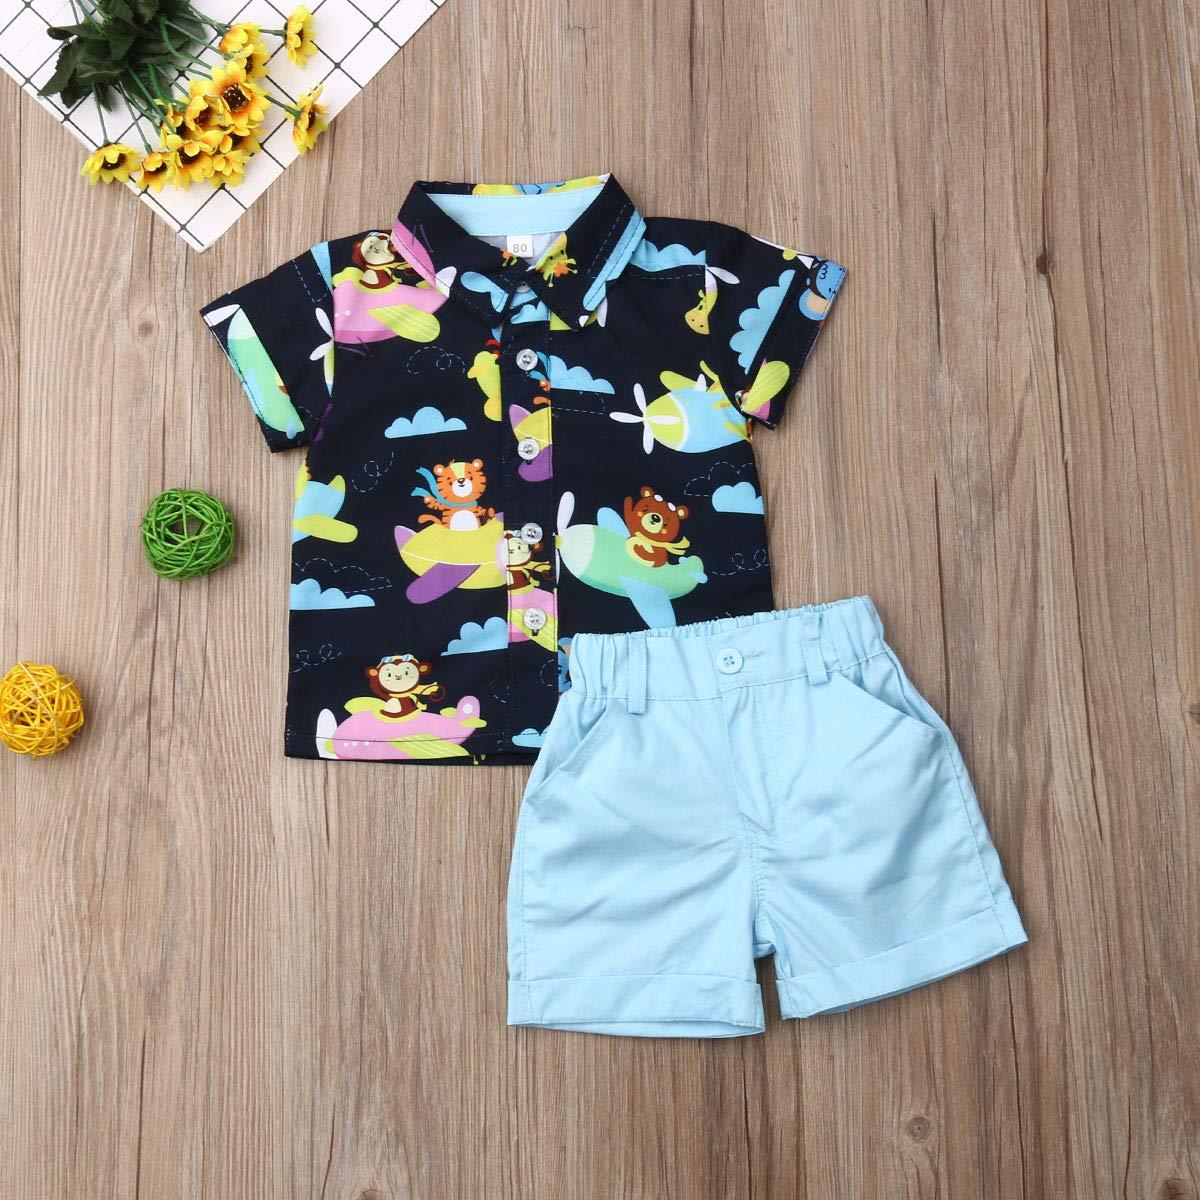 Dinosaur Button Down Shirt Baby Gentleman Tops+Shorts Pants Outfits Set